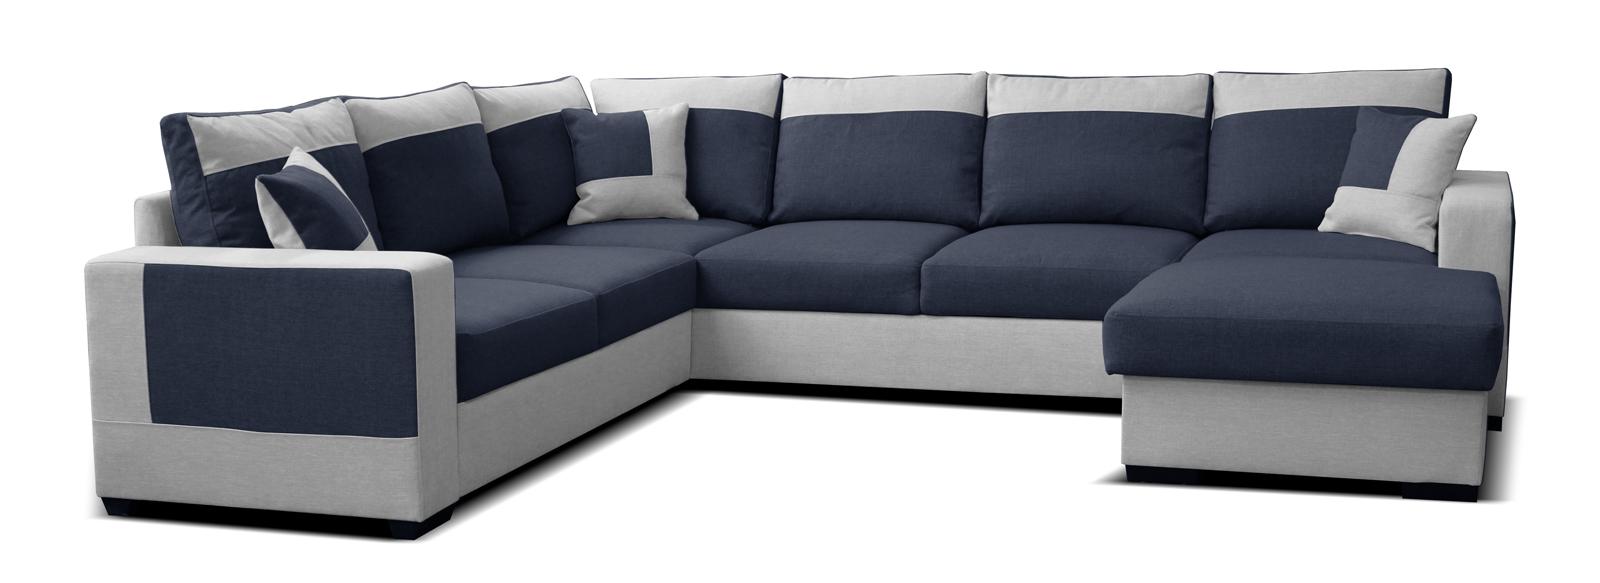 Rohová sedací souprava U - Po-Sed - Mega 2+A+2F+L (modrá + šedá) (P)